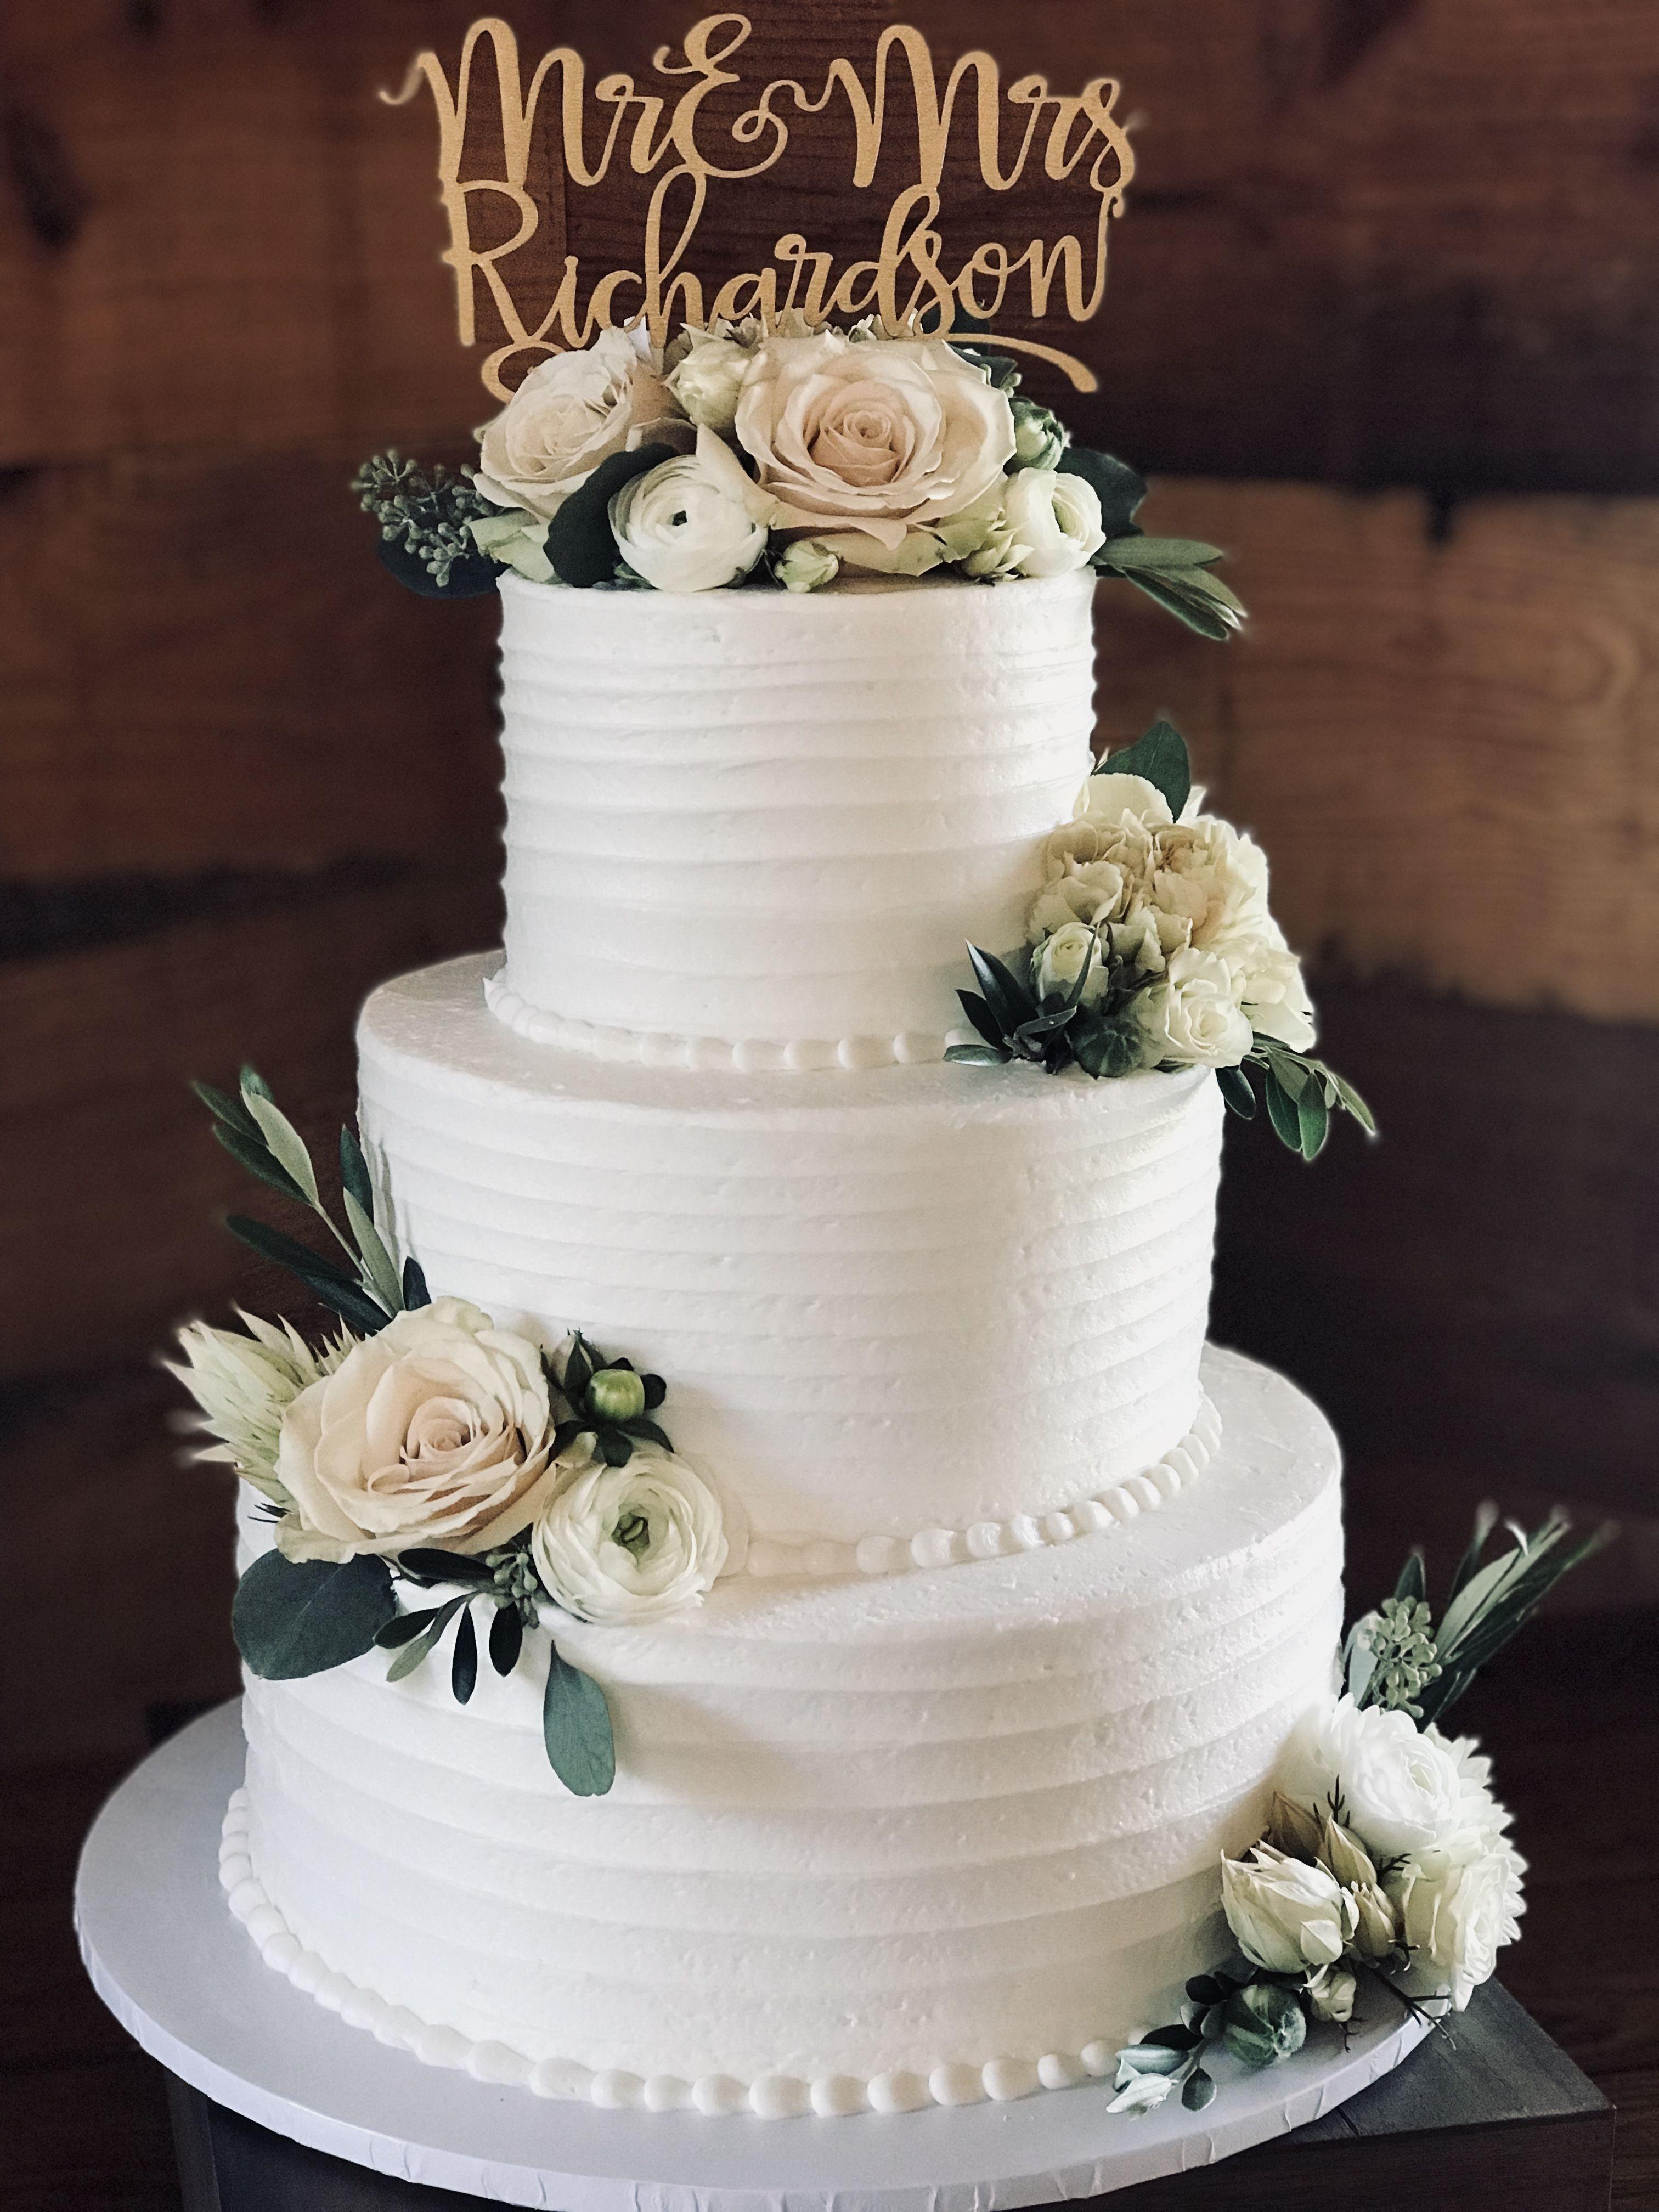 33 Dreamy Rustic Wedding Cake Ideas Everyone Loves Weddinginclude Floral Wedding Cakes Beautiful Wedding Cakes Simple Wedding Cake